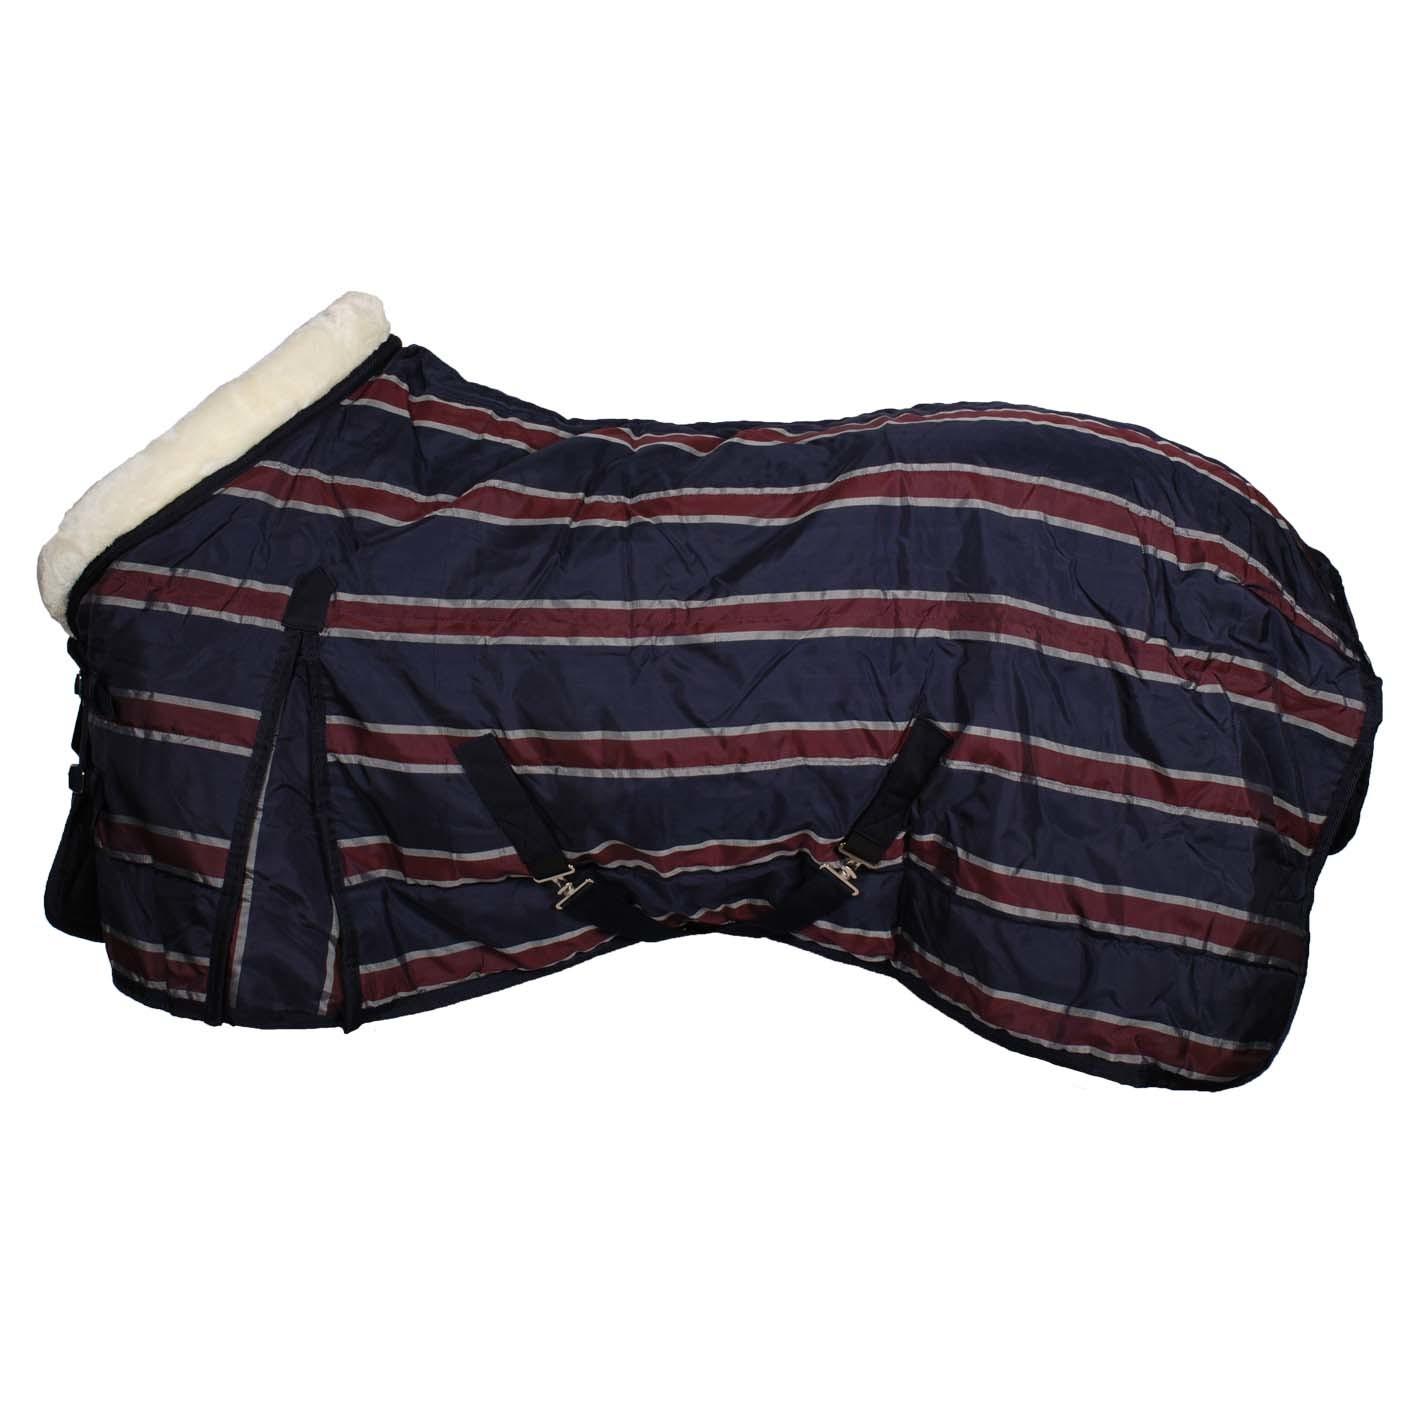 Pagony Stripe 160 staldeken donkerblauw maat:175